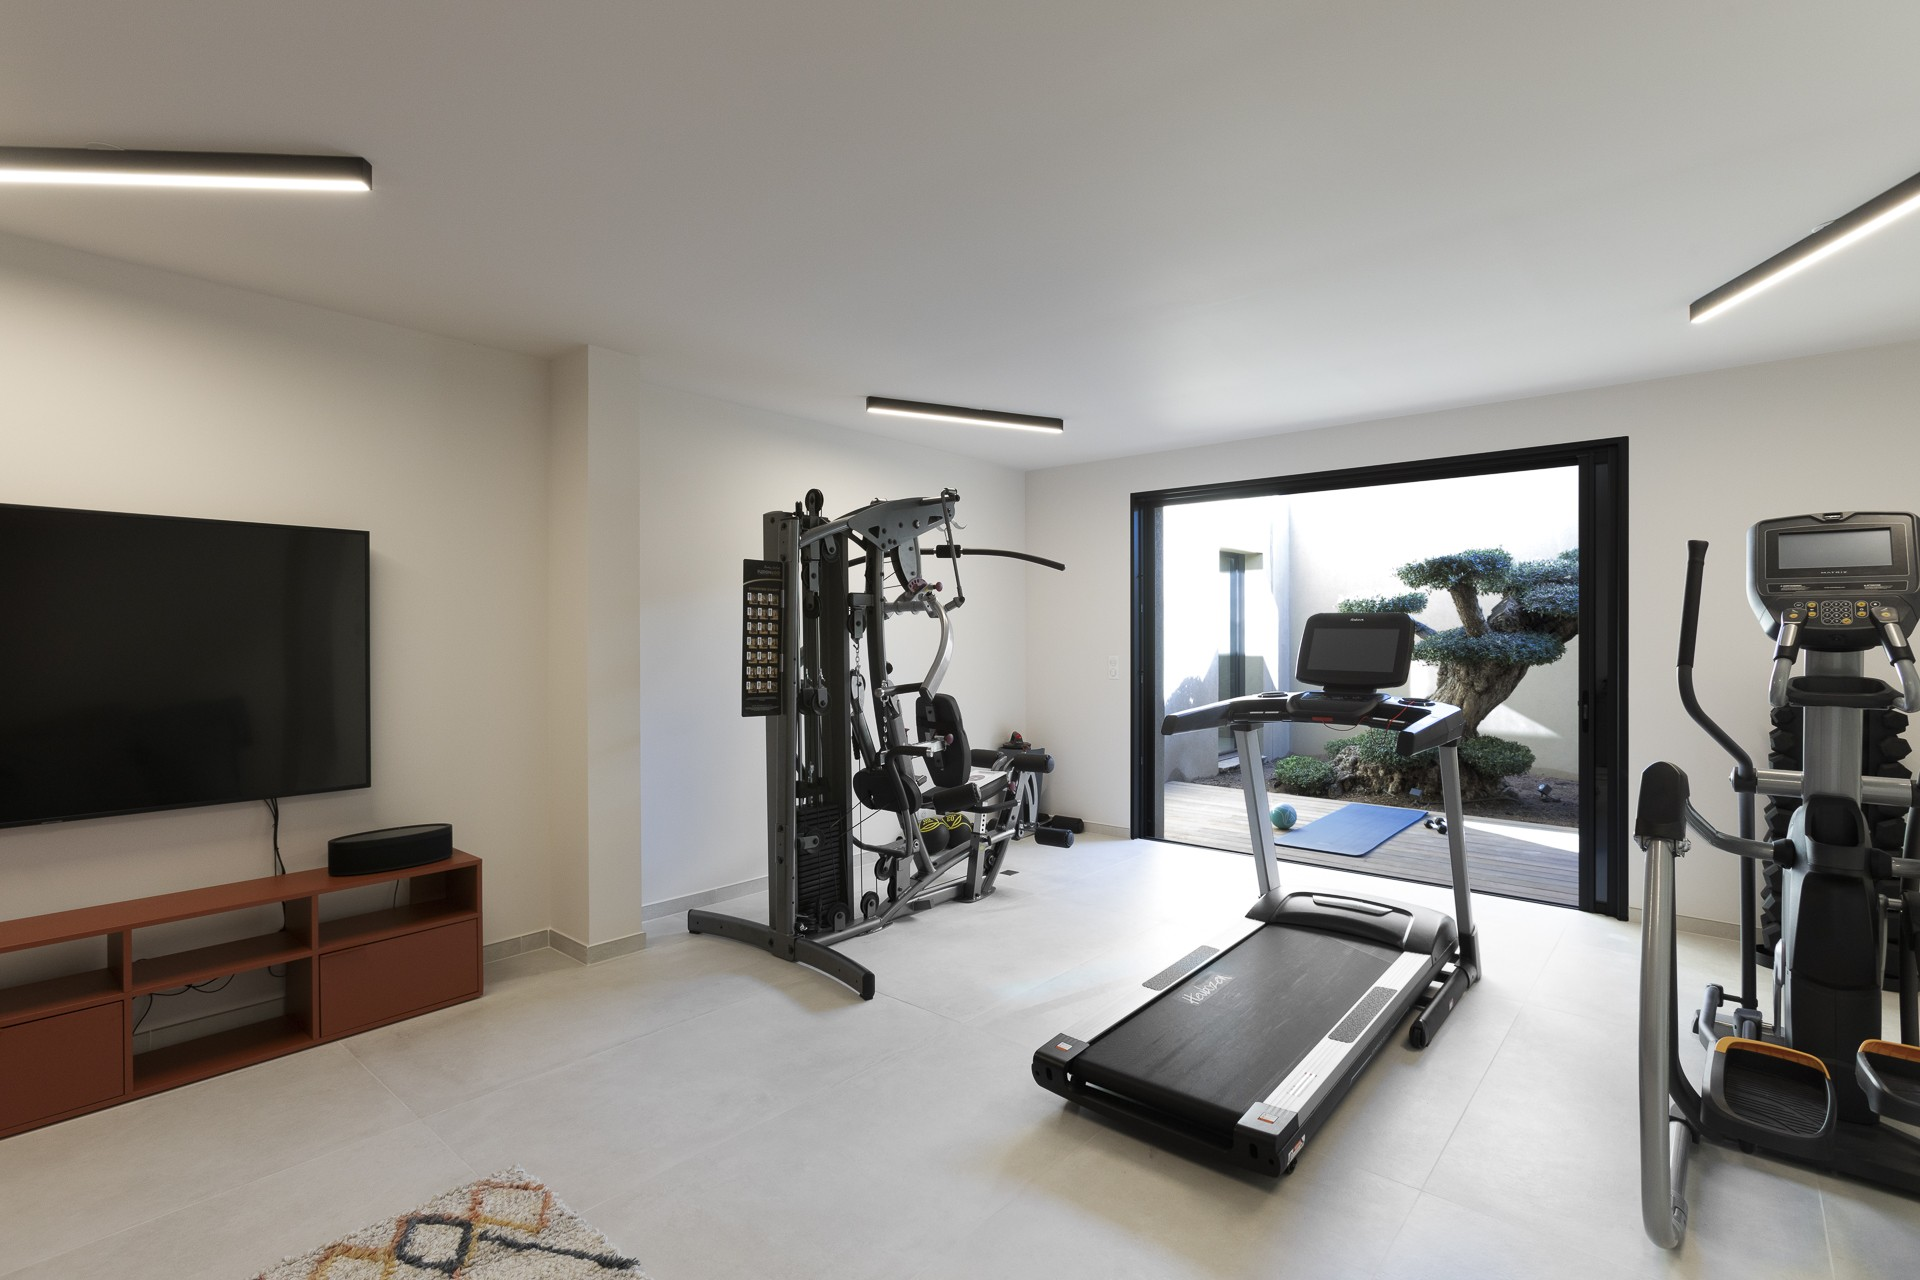 Porto Vecchio Luxury Rental Villa Perle Fitness Room 3